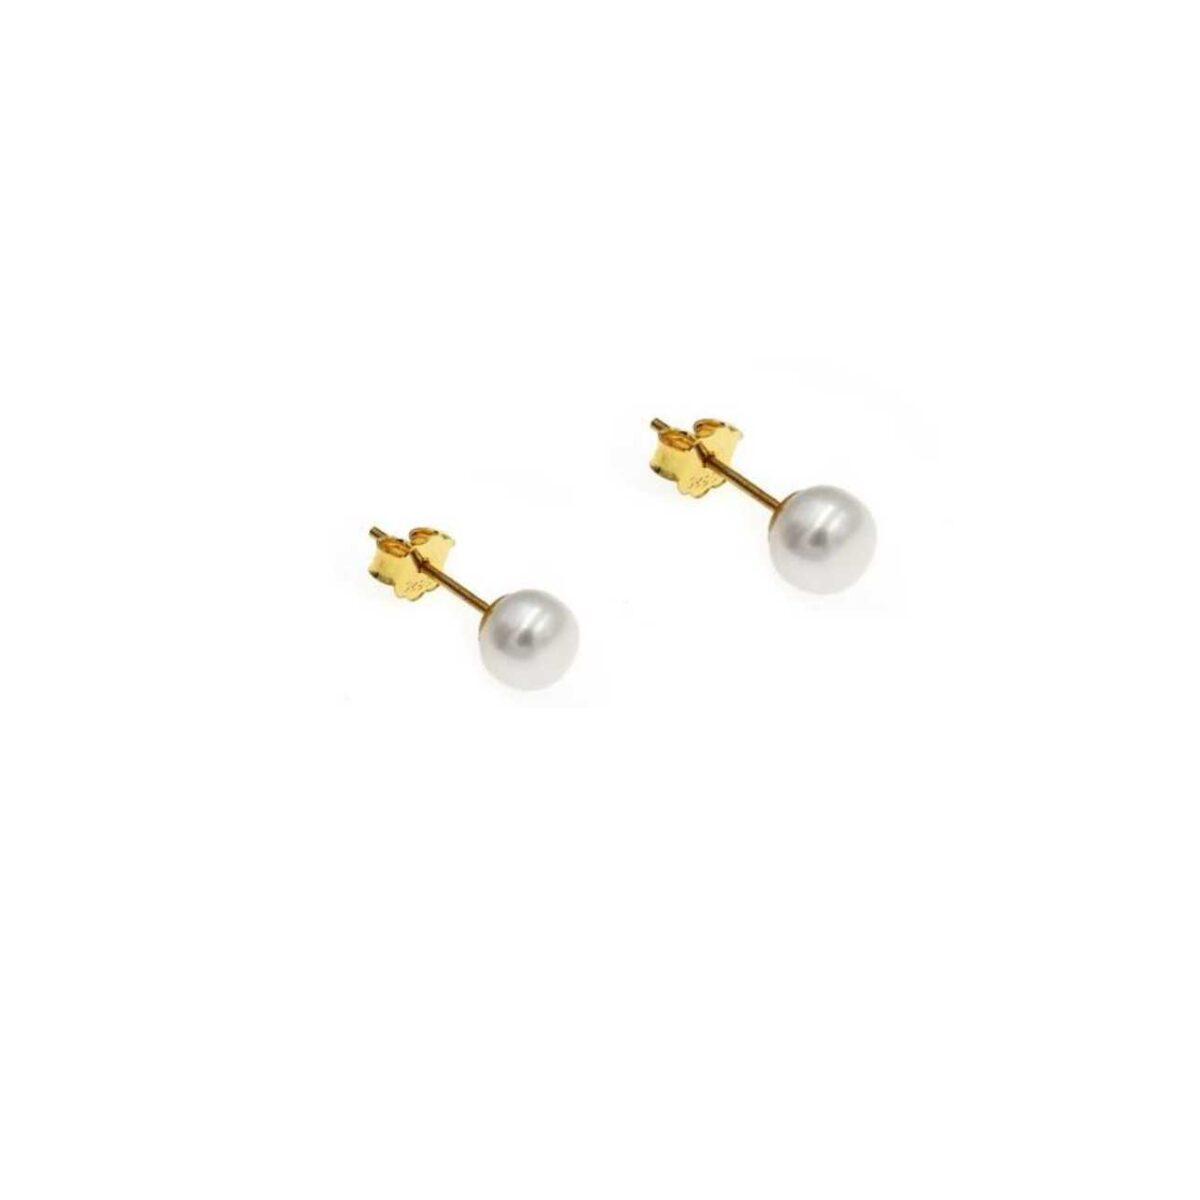 Pearl earrings II gold plated